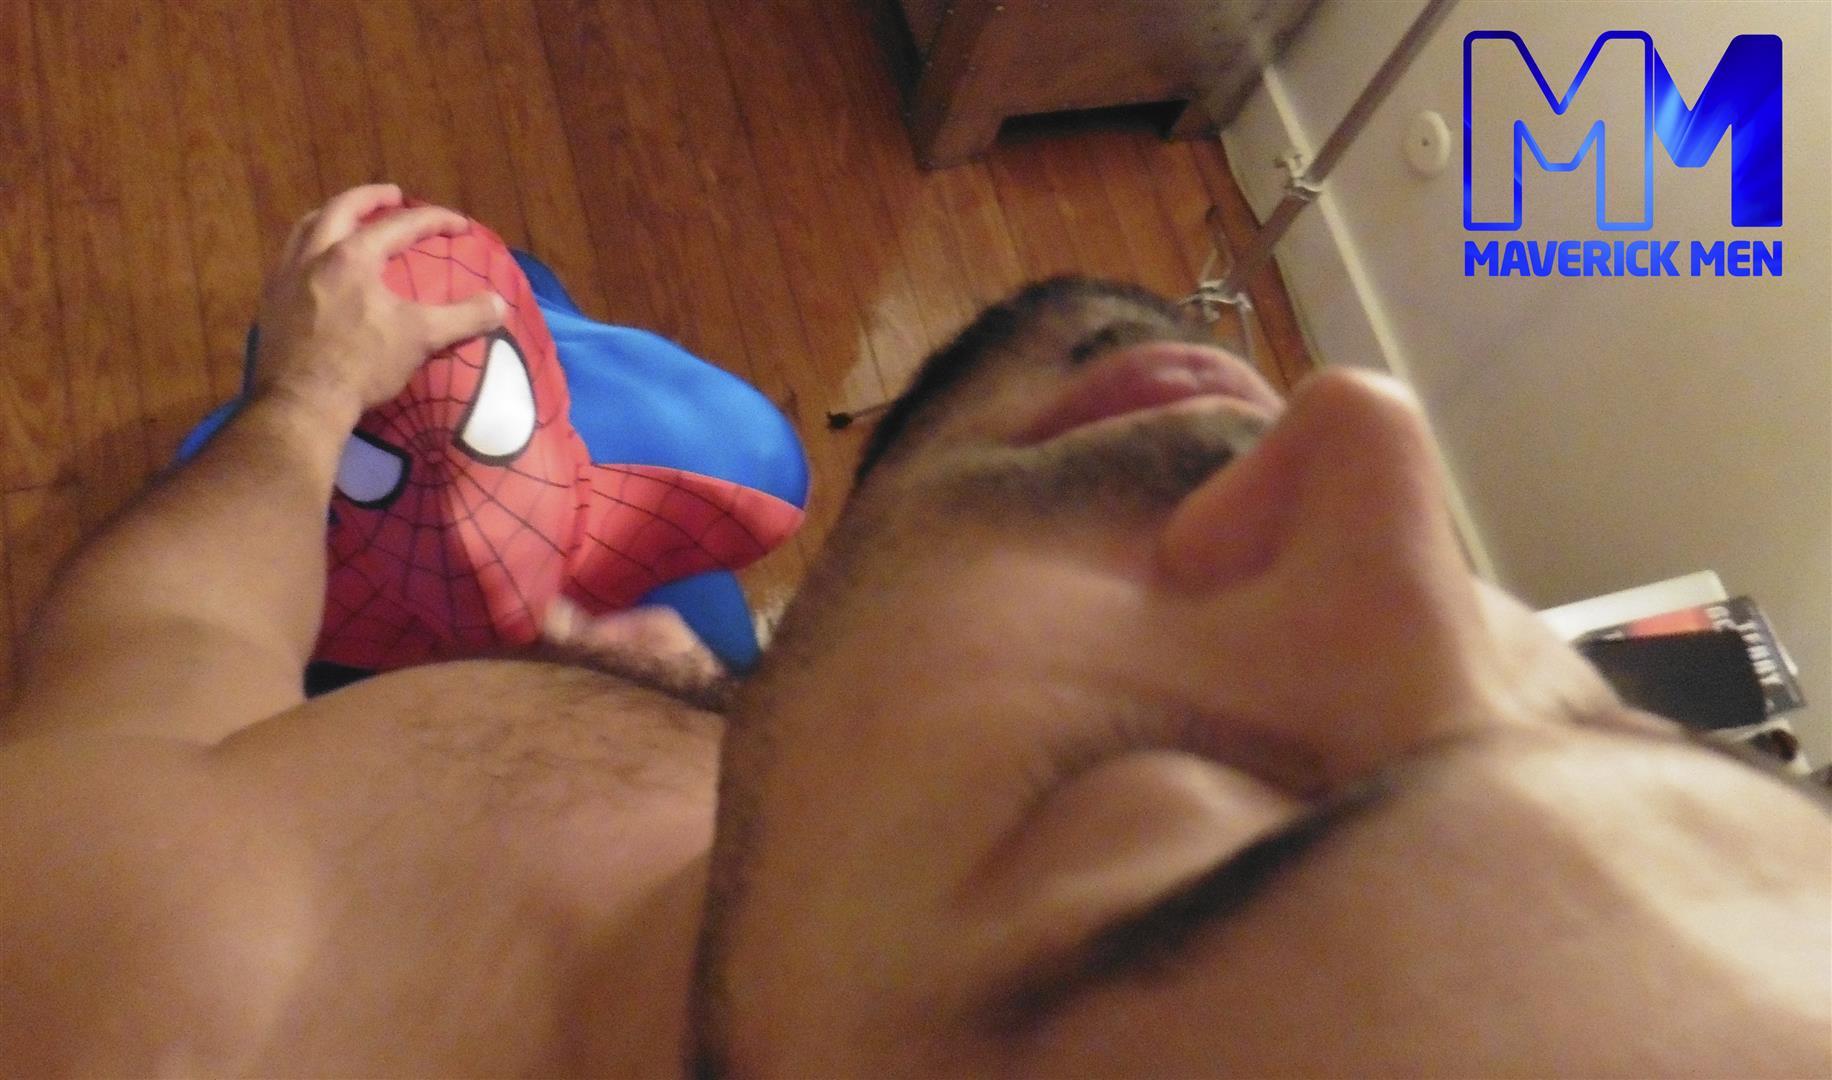 Maverick-Men-Spiderman-With-A-Big-Black-Dick-Bareback-Threesome-Amateur-Gay-Porn-12 Happy Halloween... Did You Know That Spiderman Has A Big Black Dick?